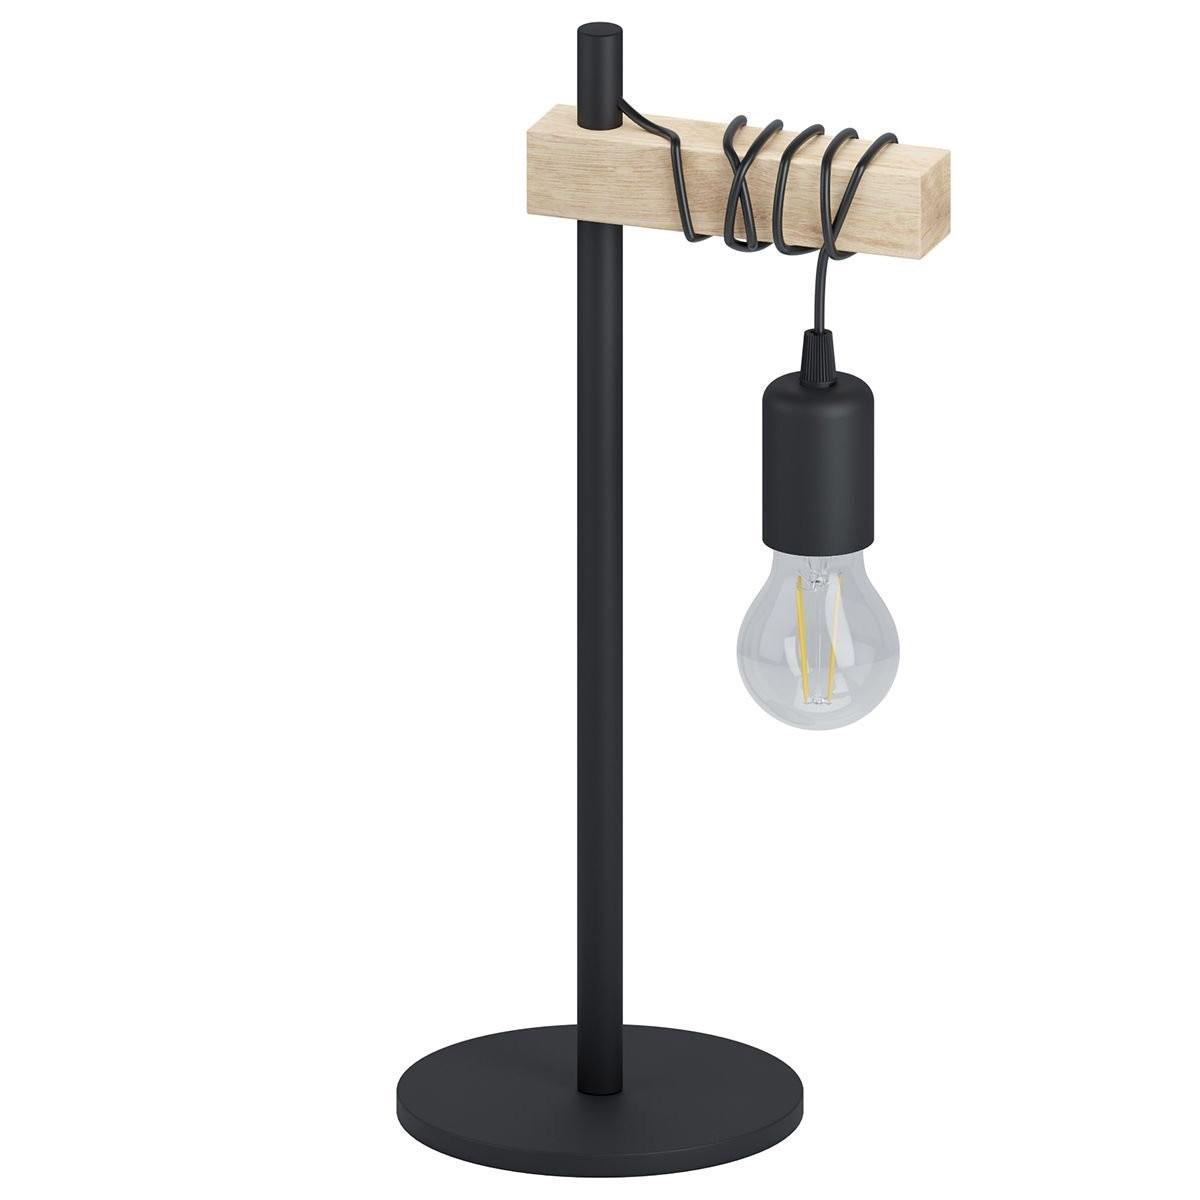 Lampe Leroy Merlin